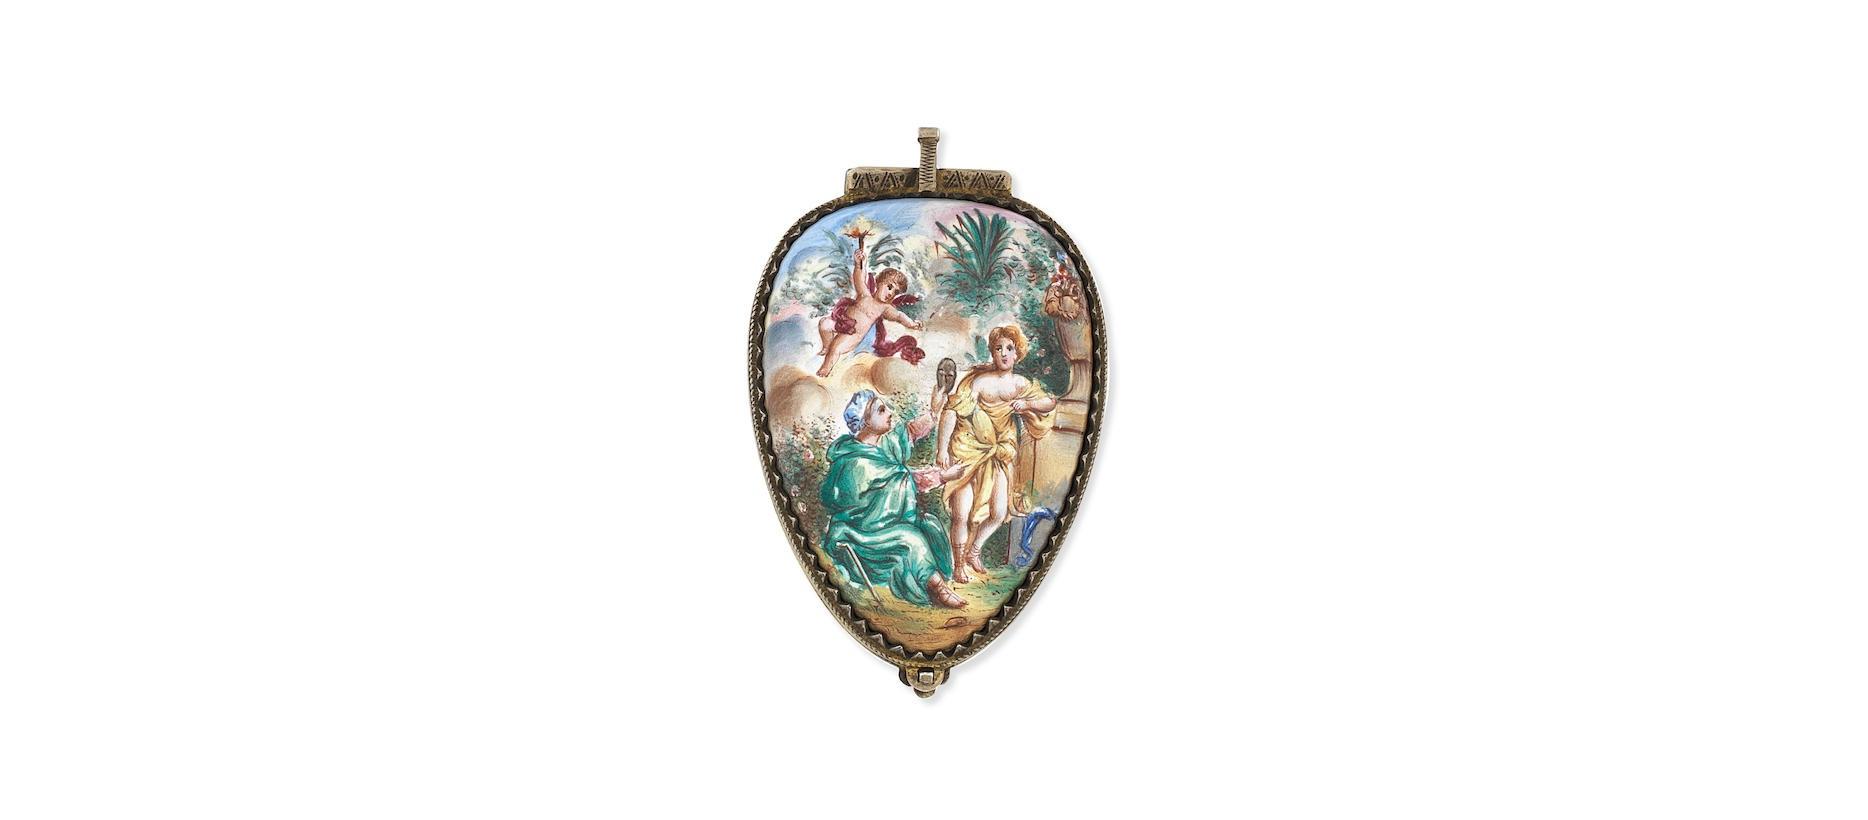 Lot 6 - A gilt metal and polychrome enamel key wind pendant pocket watch